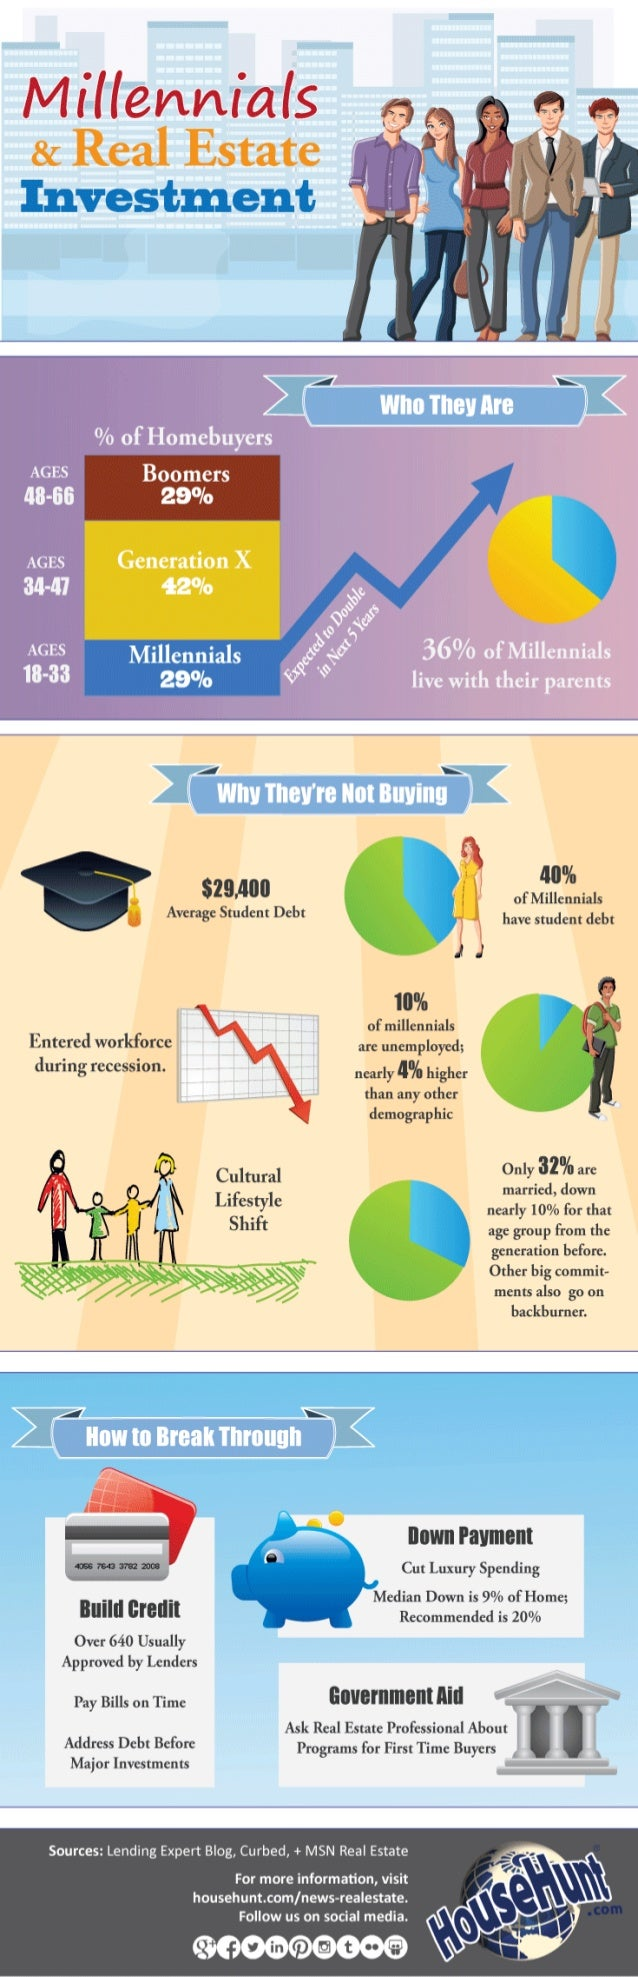 M iflennials 8: Real Estate     Boomers 29%  Generation X 42°/ o       $29.40!!   Average Student Debt     - 40% of Millenn...